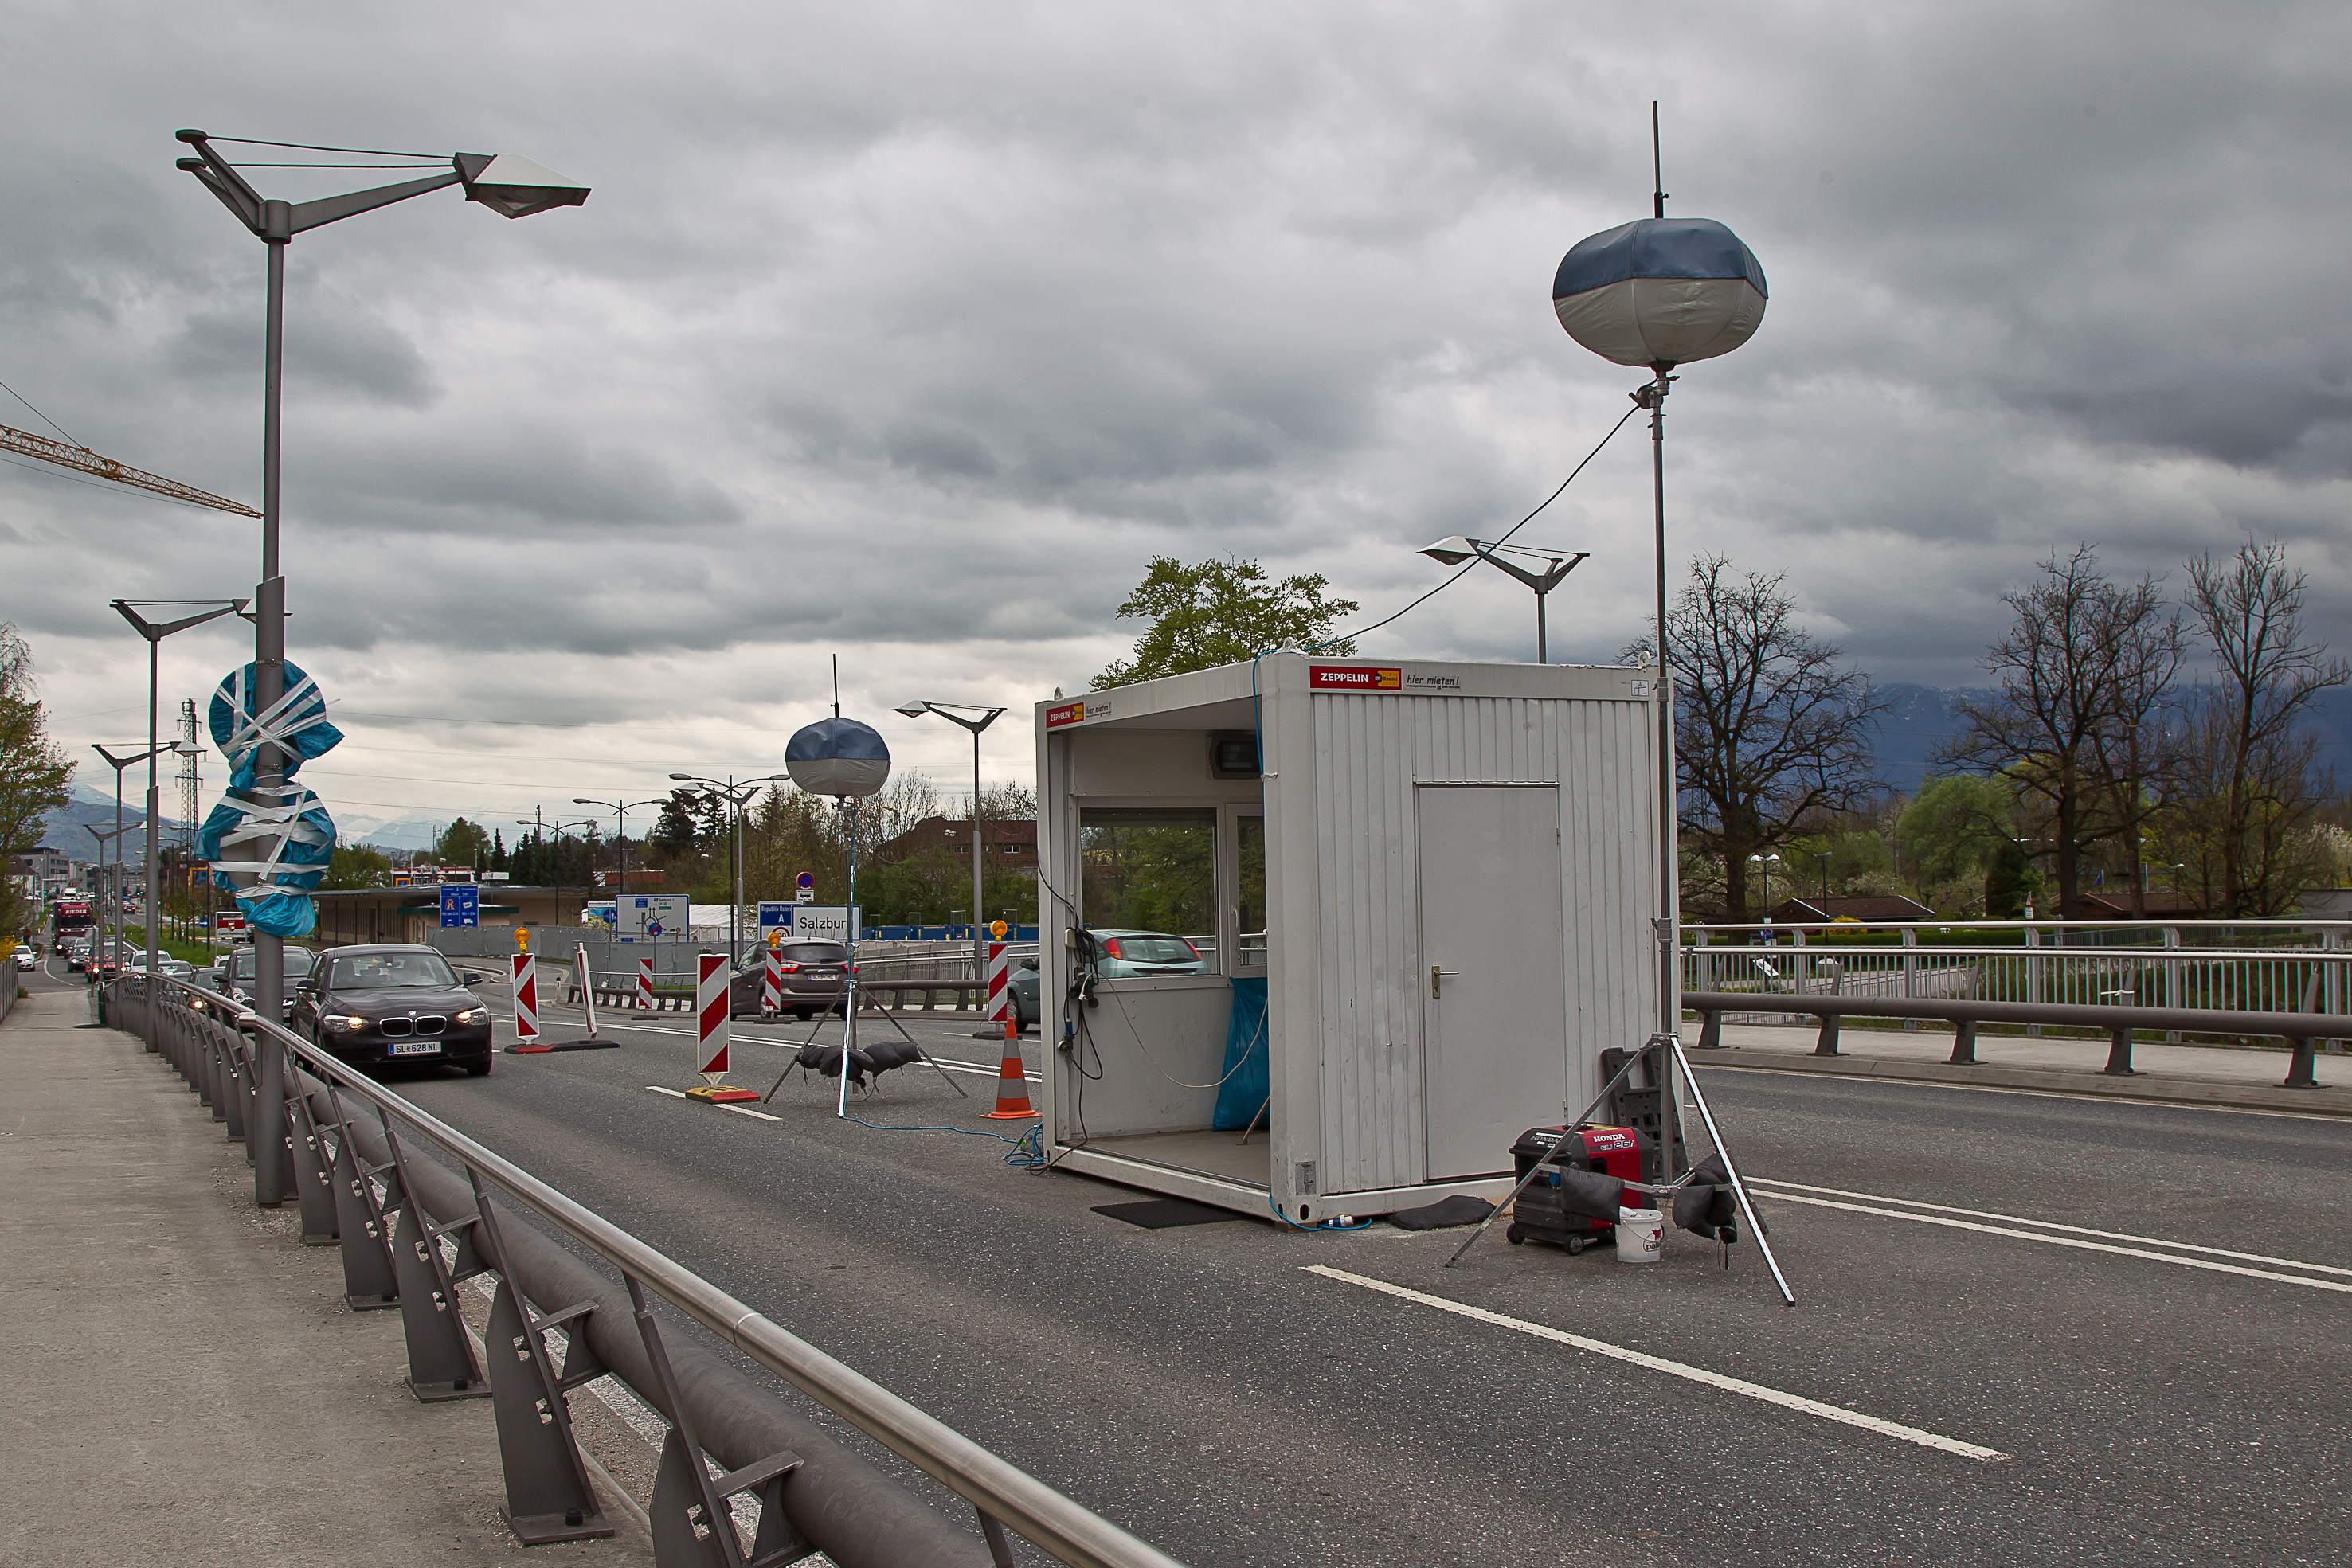 Grenzübergang Freilassing